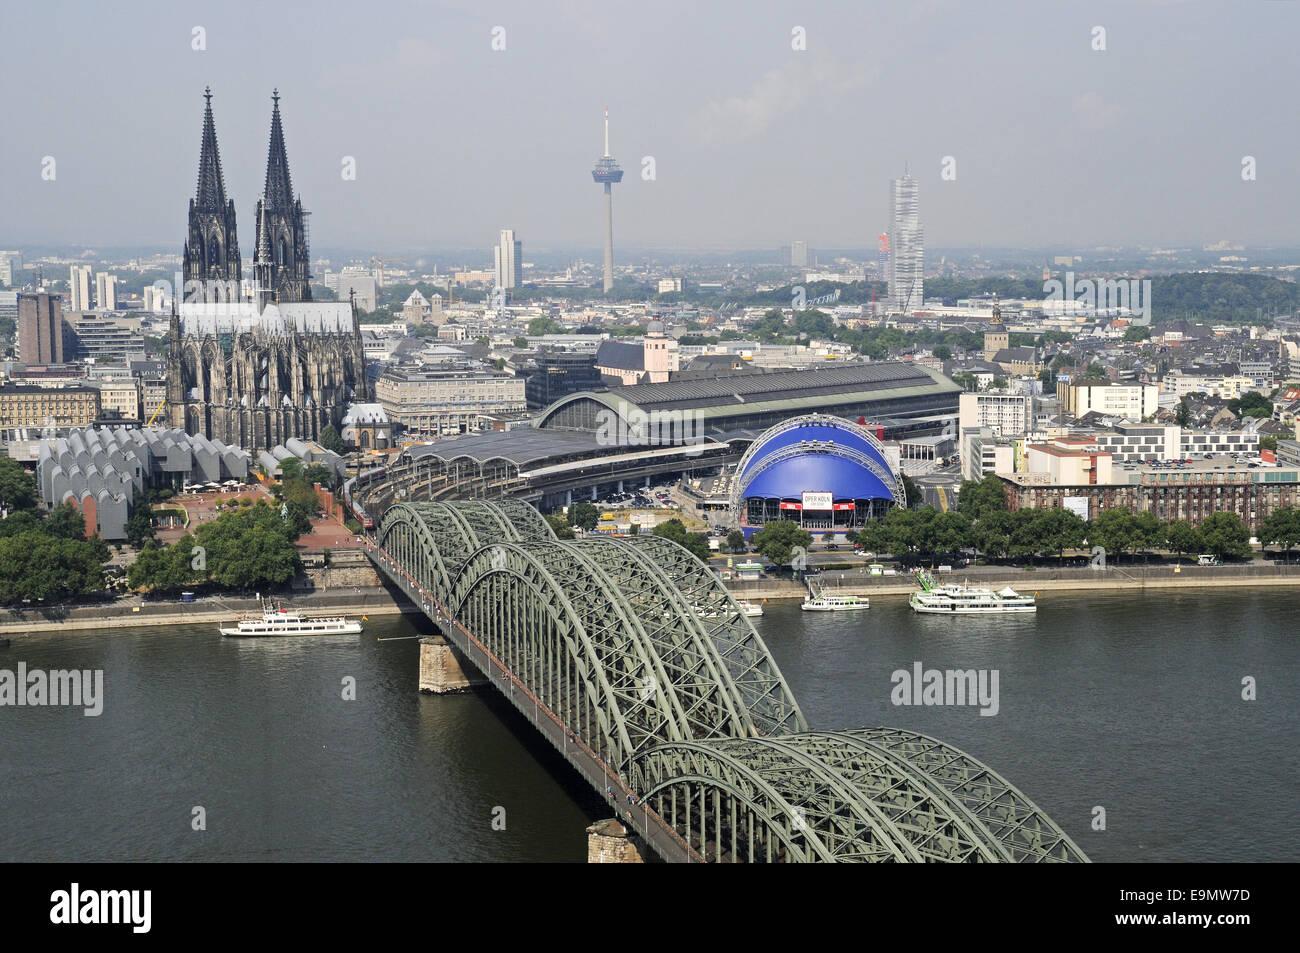 Hohenzollern Bridge, Rhine River, Cologne, Germany Stock Photo